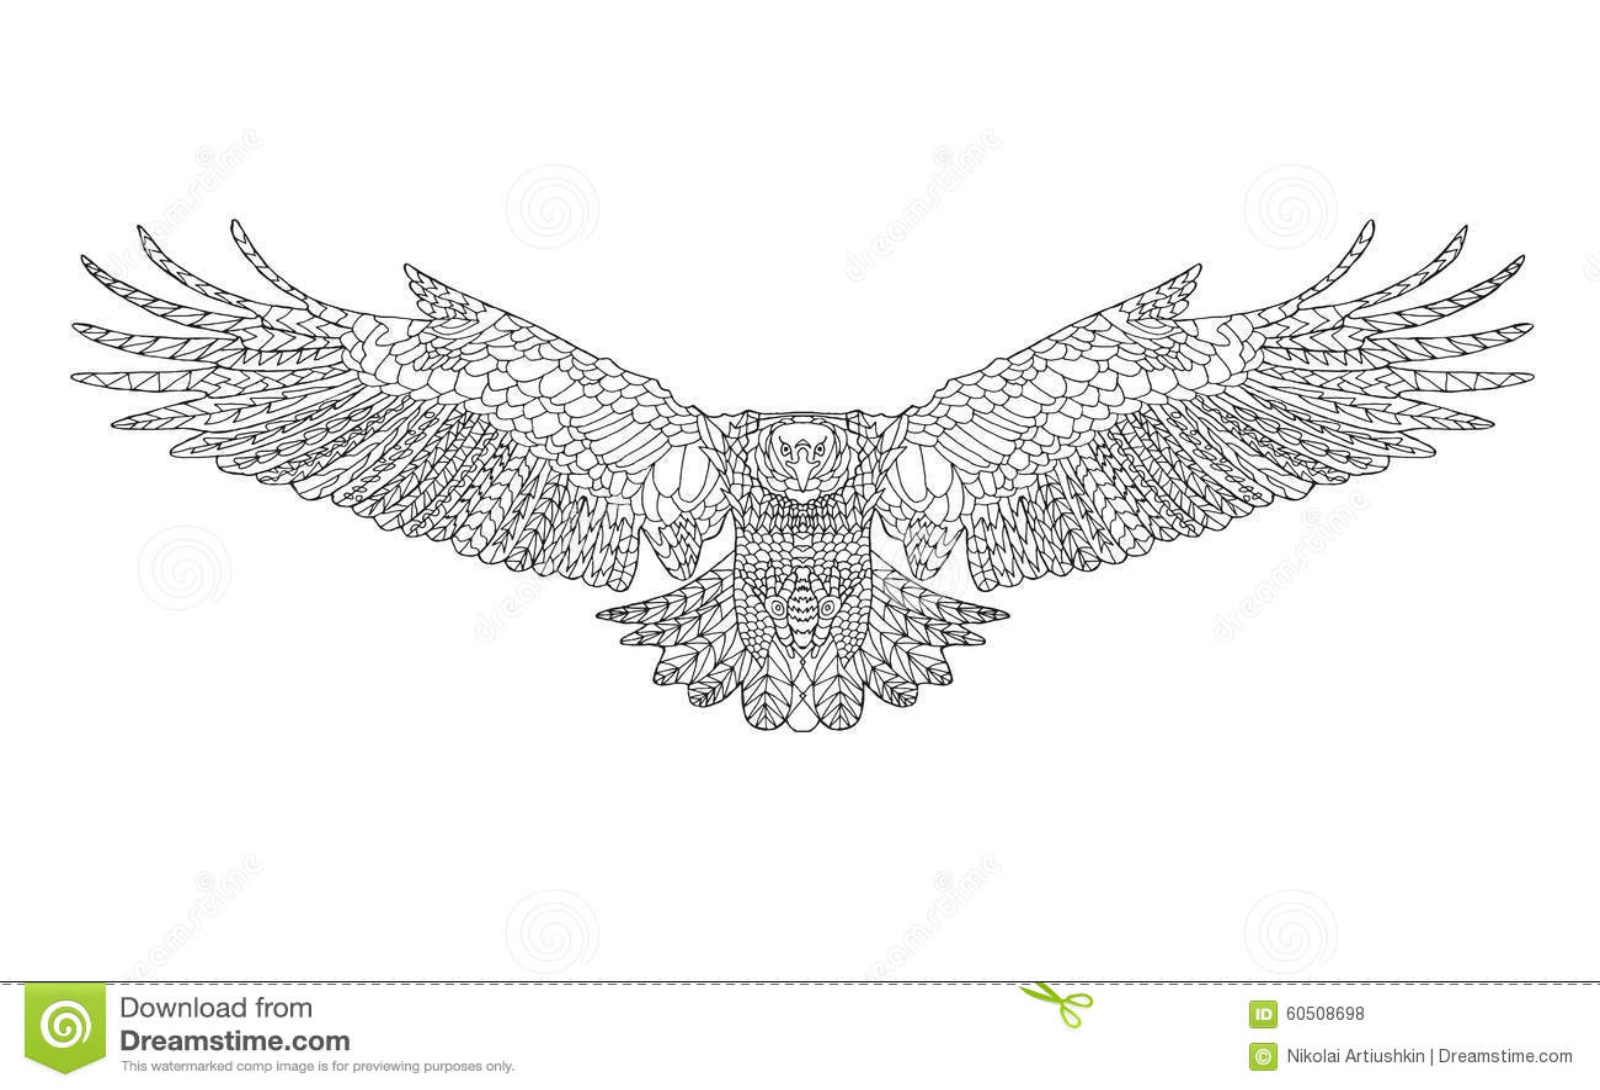 Zentangle stilisierte adler skizze f r f rbungsseite for Design hochbett fa r erwachsene